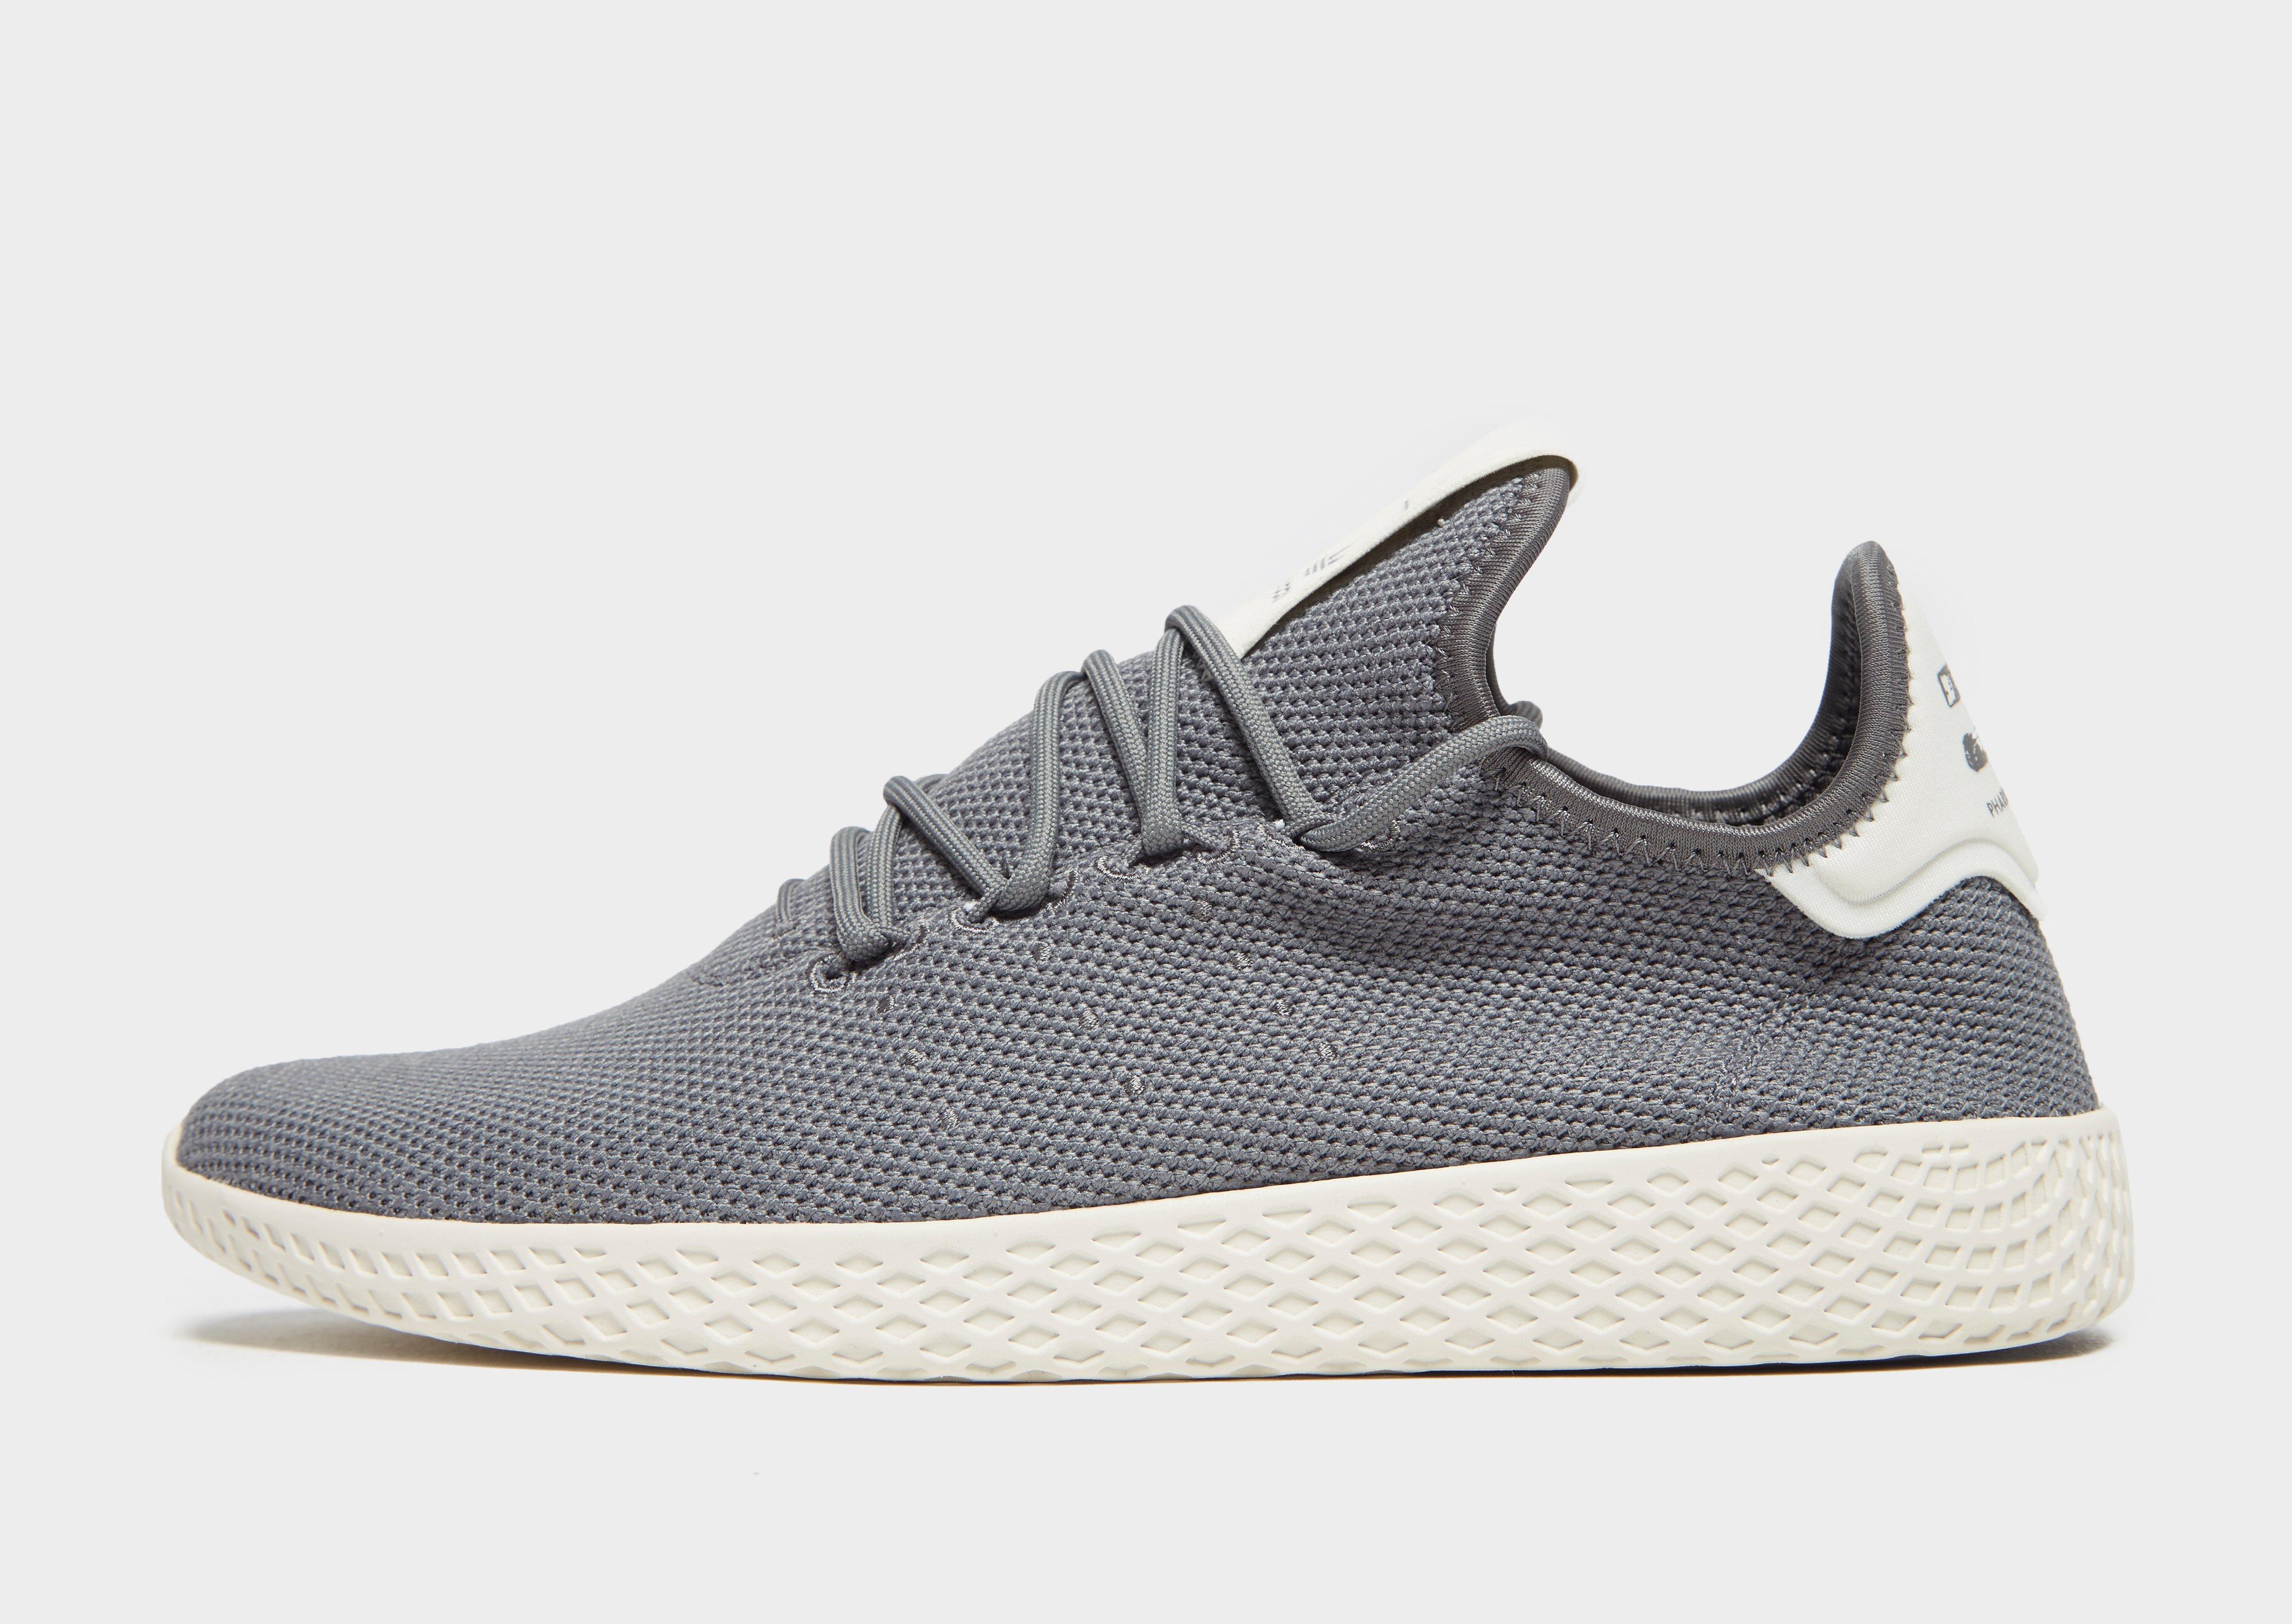 aebd573c1 Lyst - Adidas Originals X Pharrell Williams Tennis Hu in Gray for Men